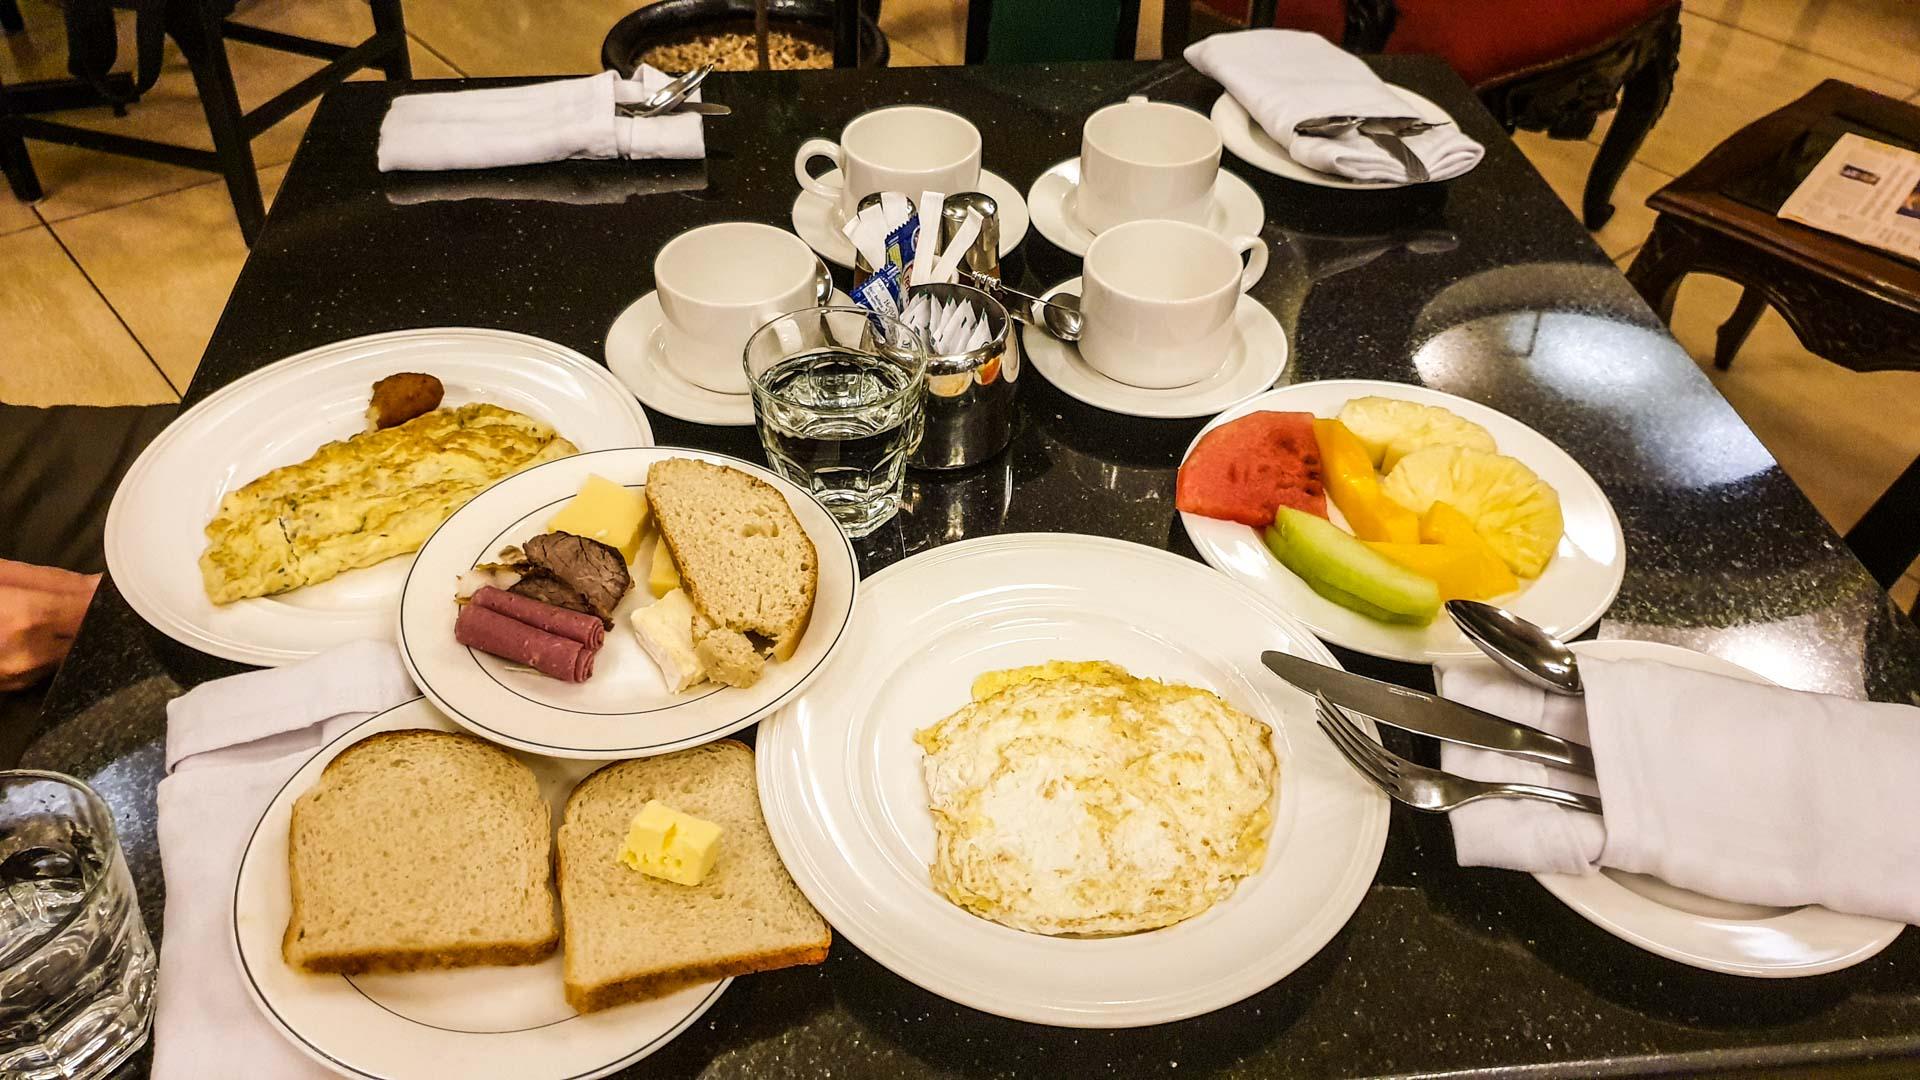 Desayuno en nuestro hotel de Nairobi, Best Western Plus Meridian